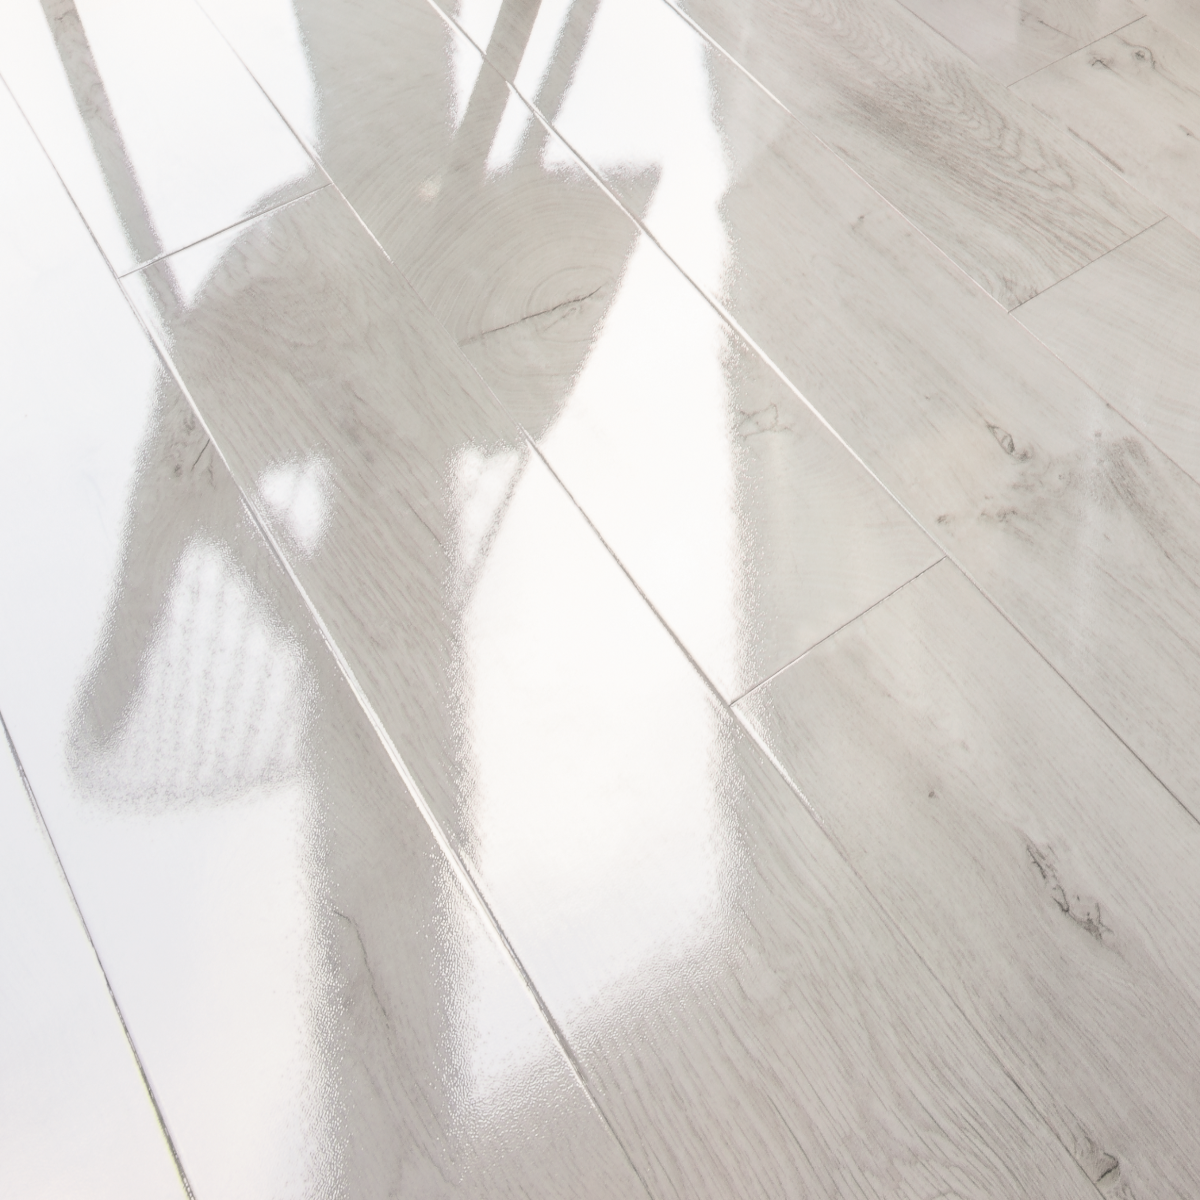 High Gloss Laminate Flooring Floors, Super Gloss White Laminate Flooring